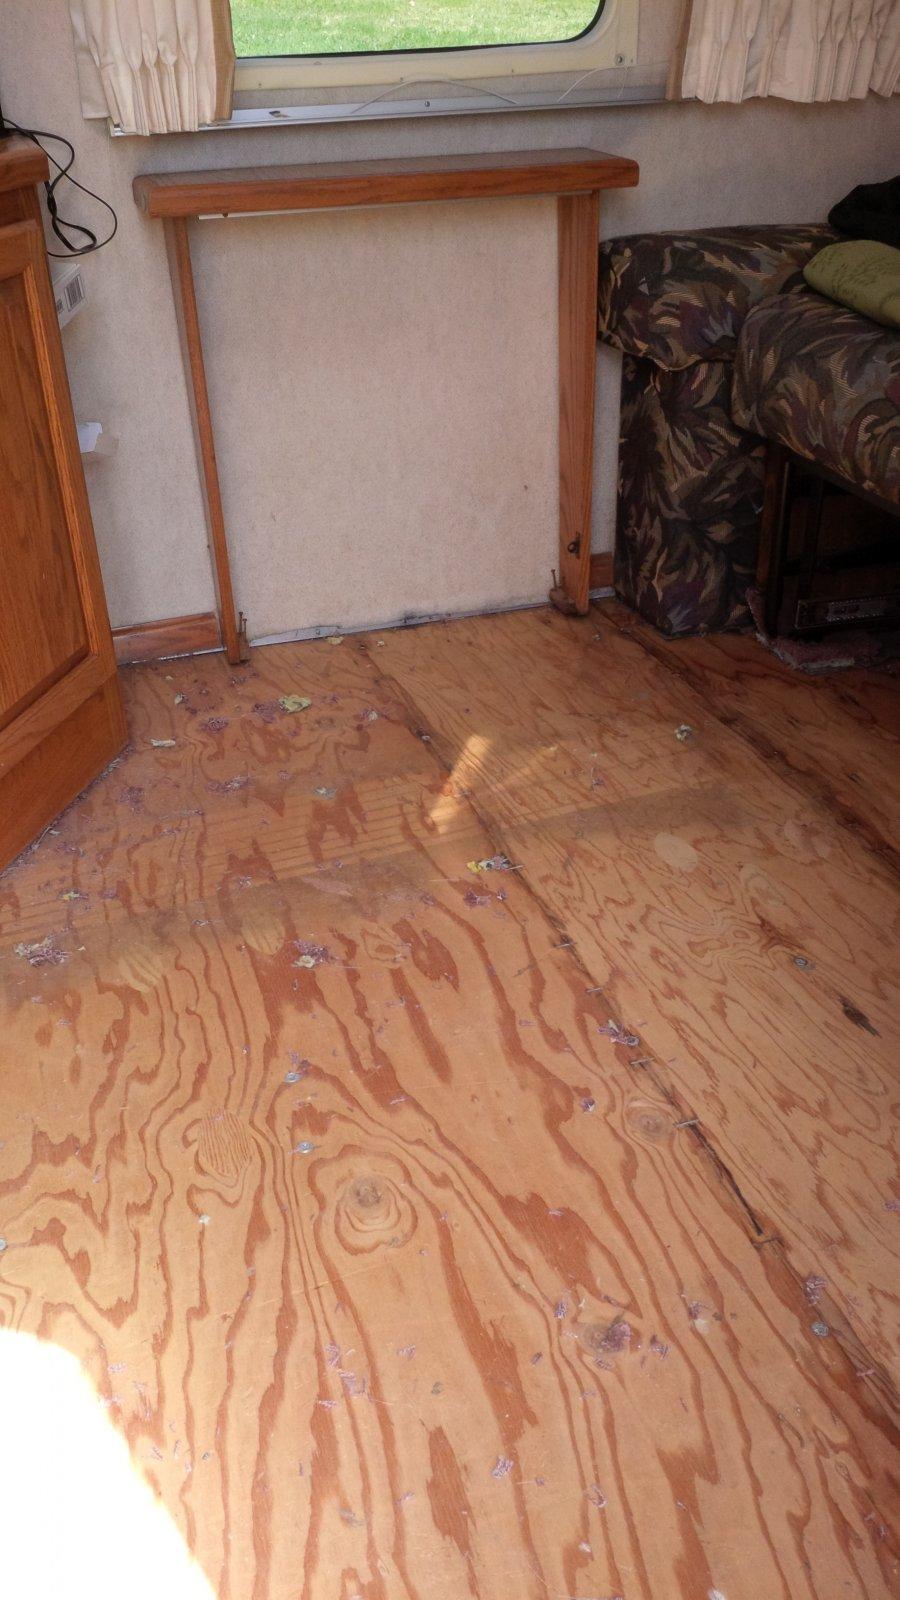 Click image for larger version  Name:carpet gone 1.jpg Views:399 Size:212.4 KB ID:185254